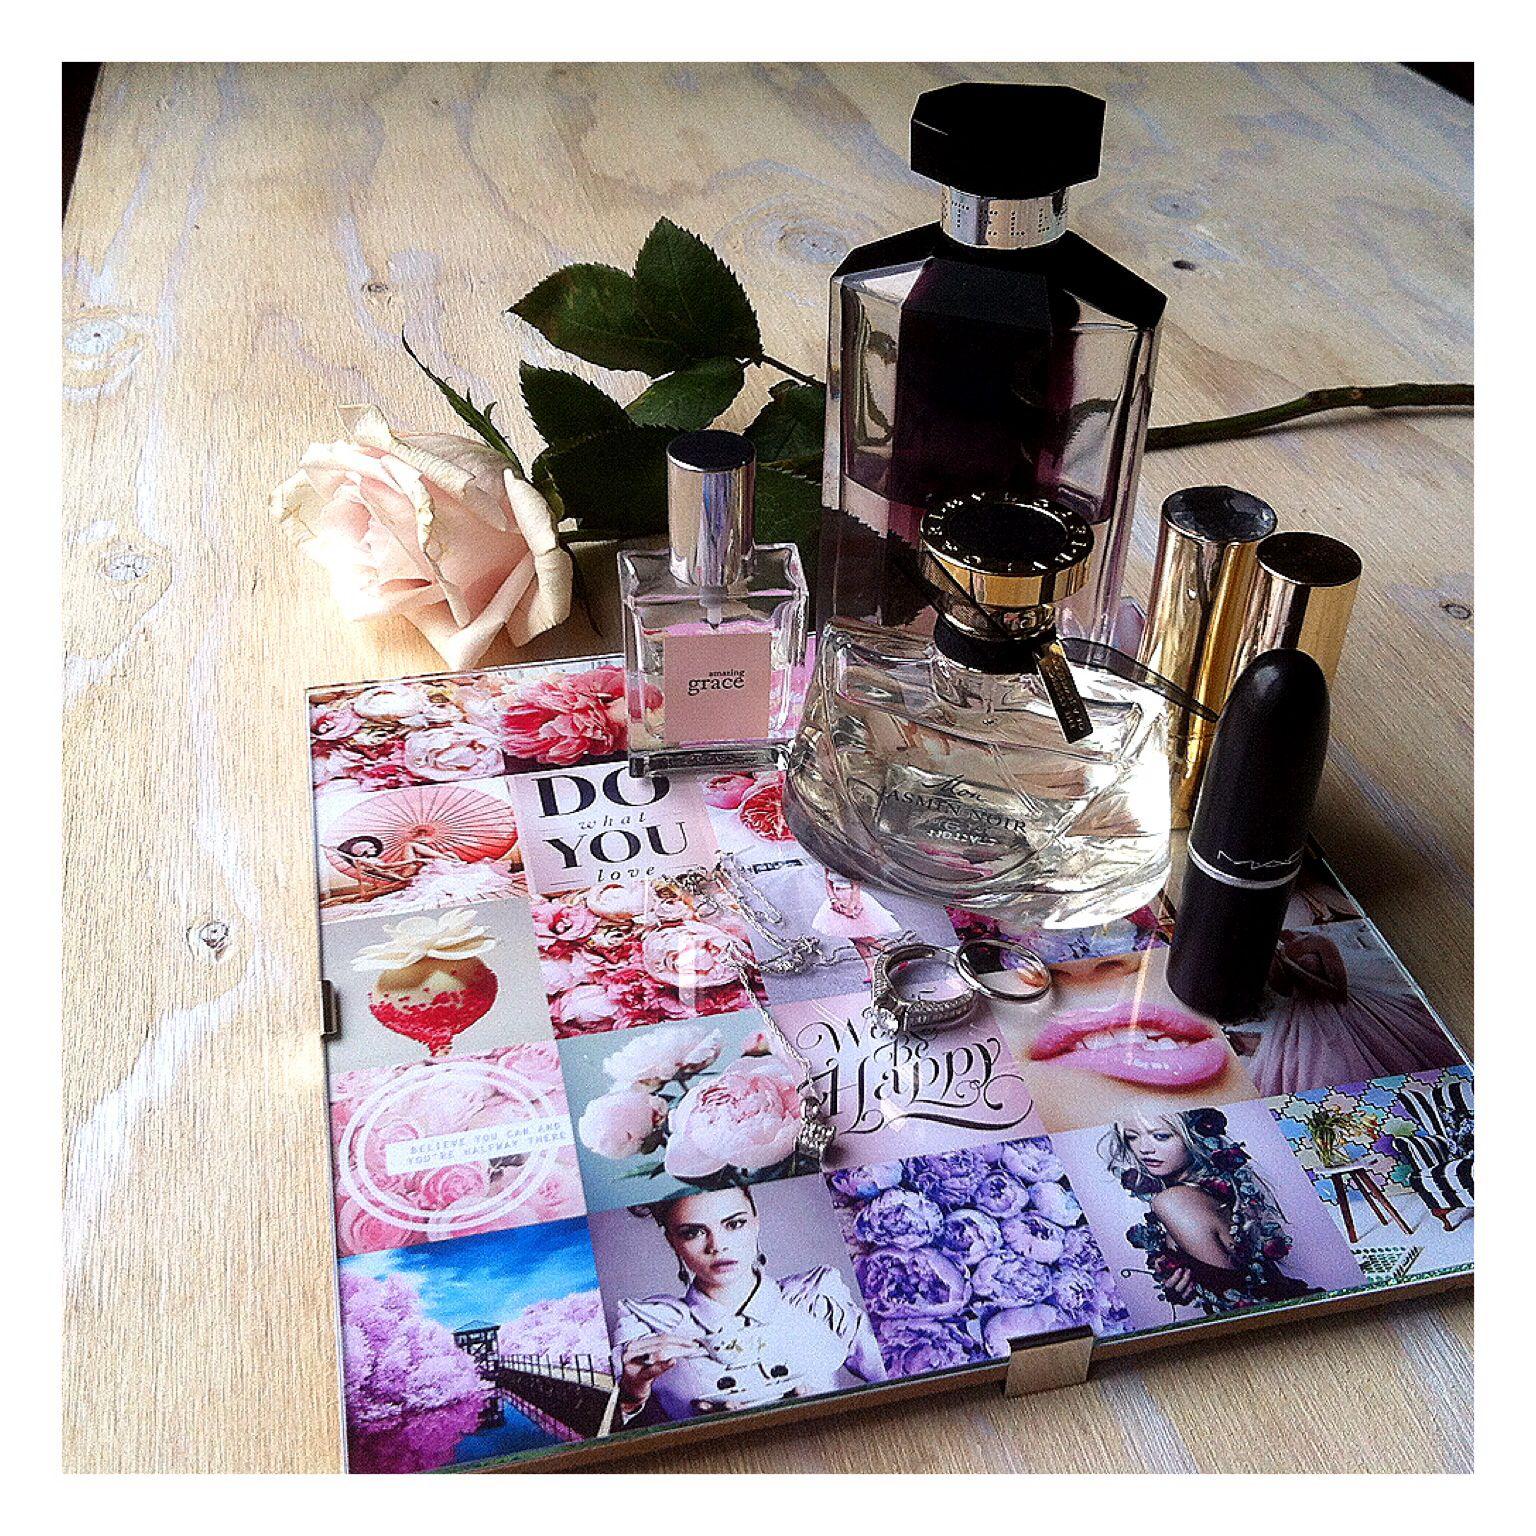 Cute decor detail #pink #perfume #hisandhers